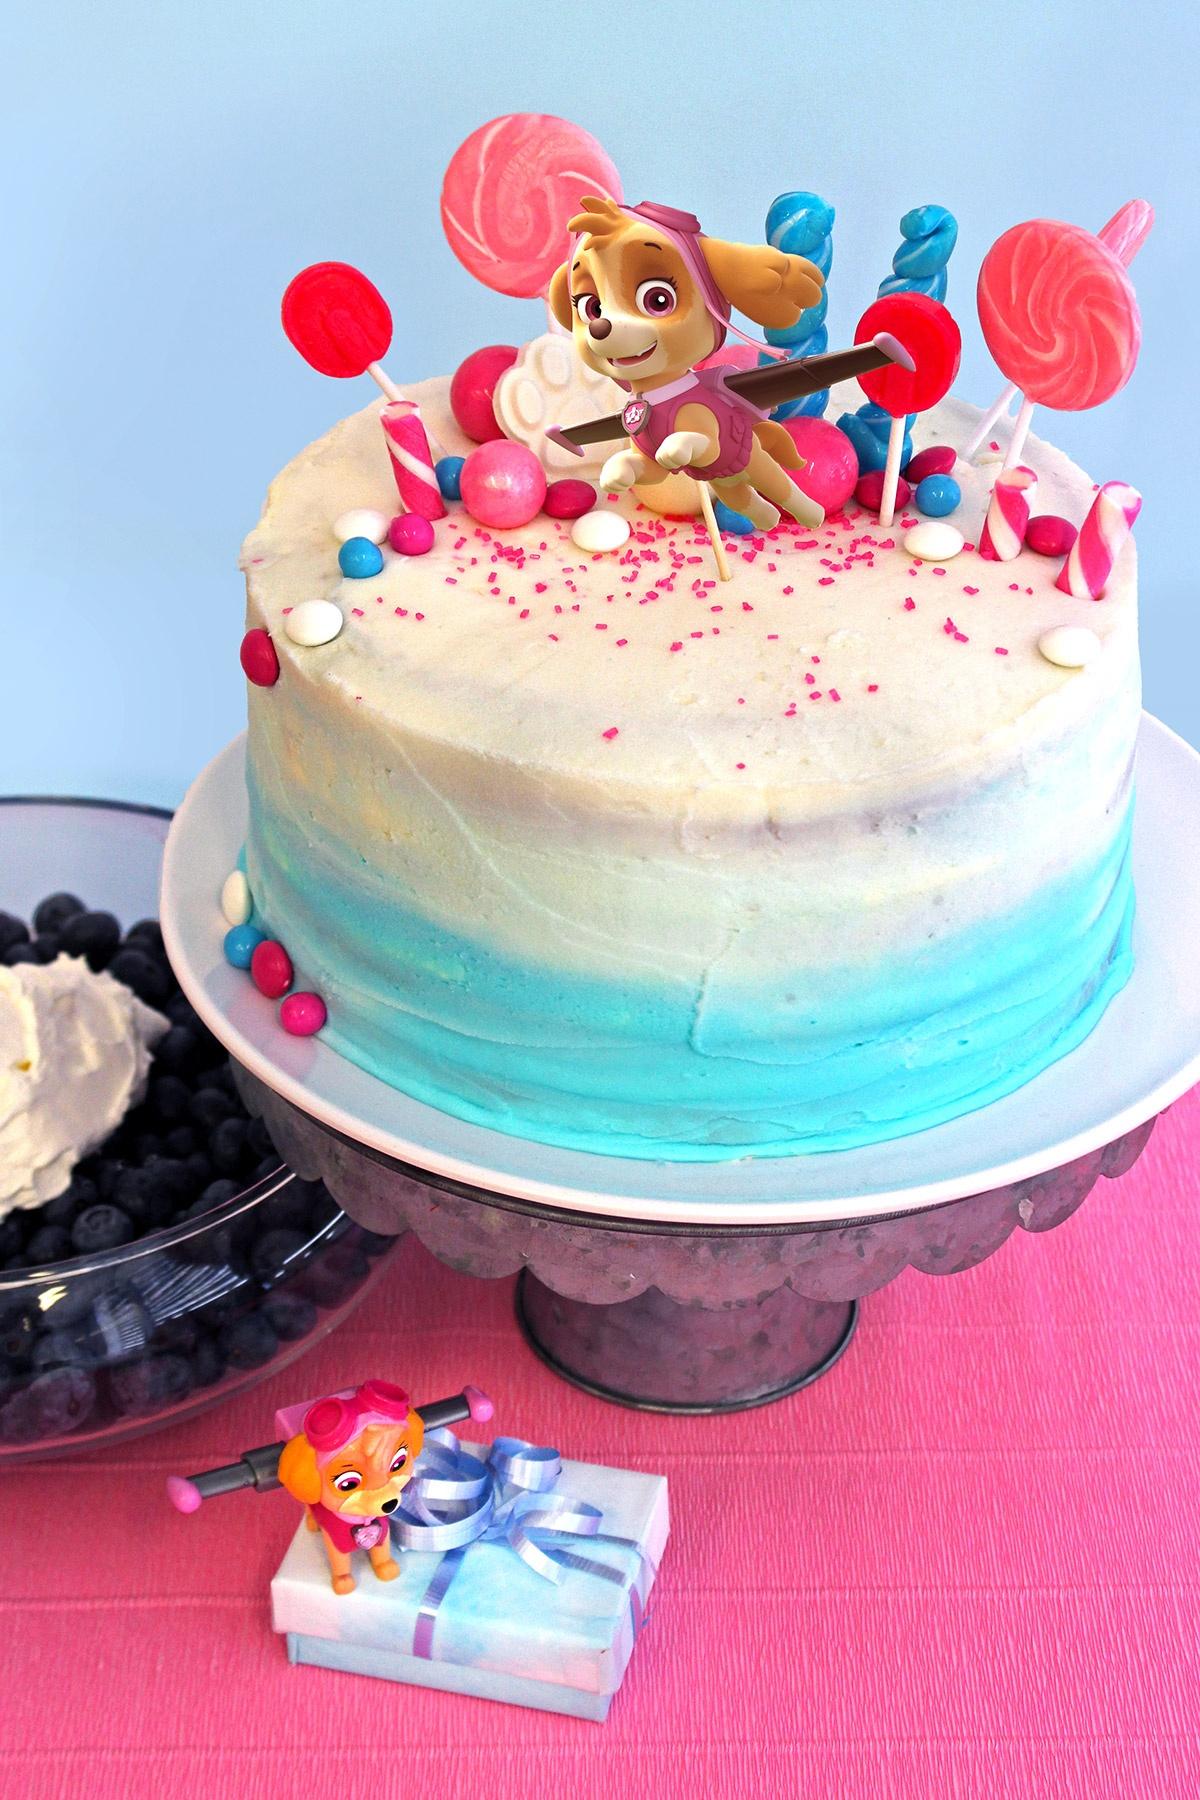 Paw Patrol Skye Birthday Cake Topper | Nickelodeon Parents - Free Printable Happy Birthday Cake Topper